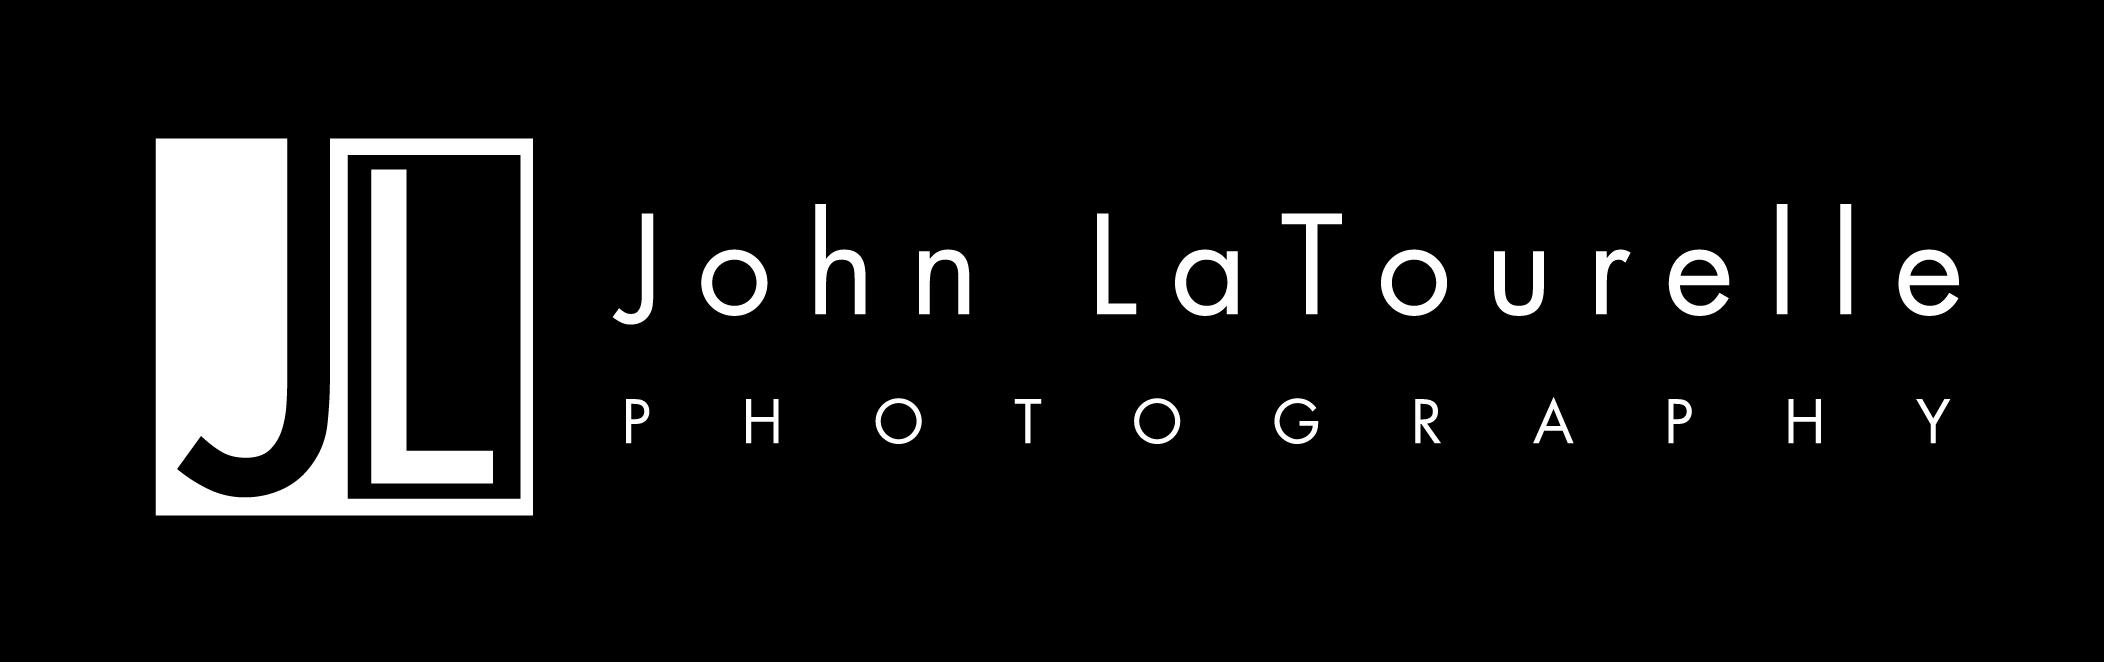 John Latourelle Photography